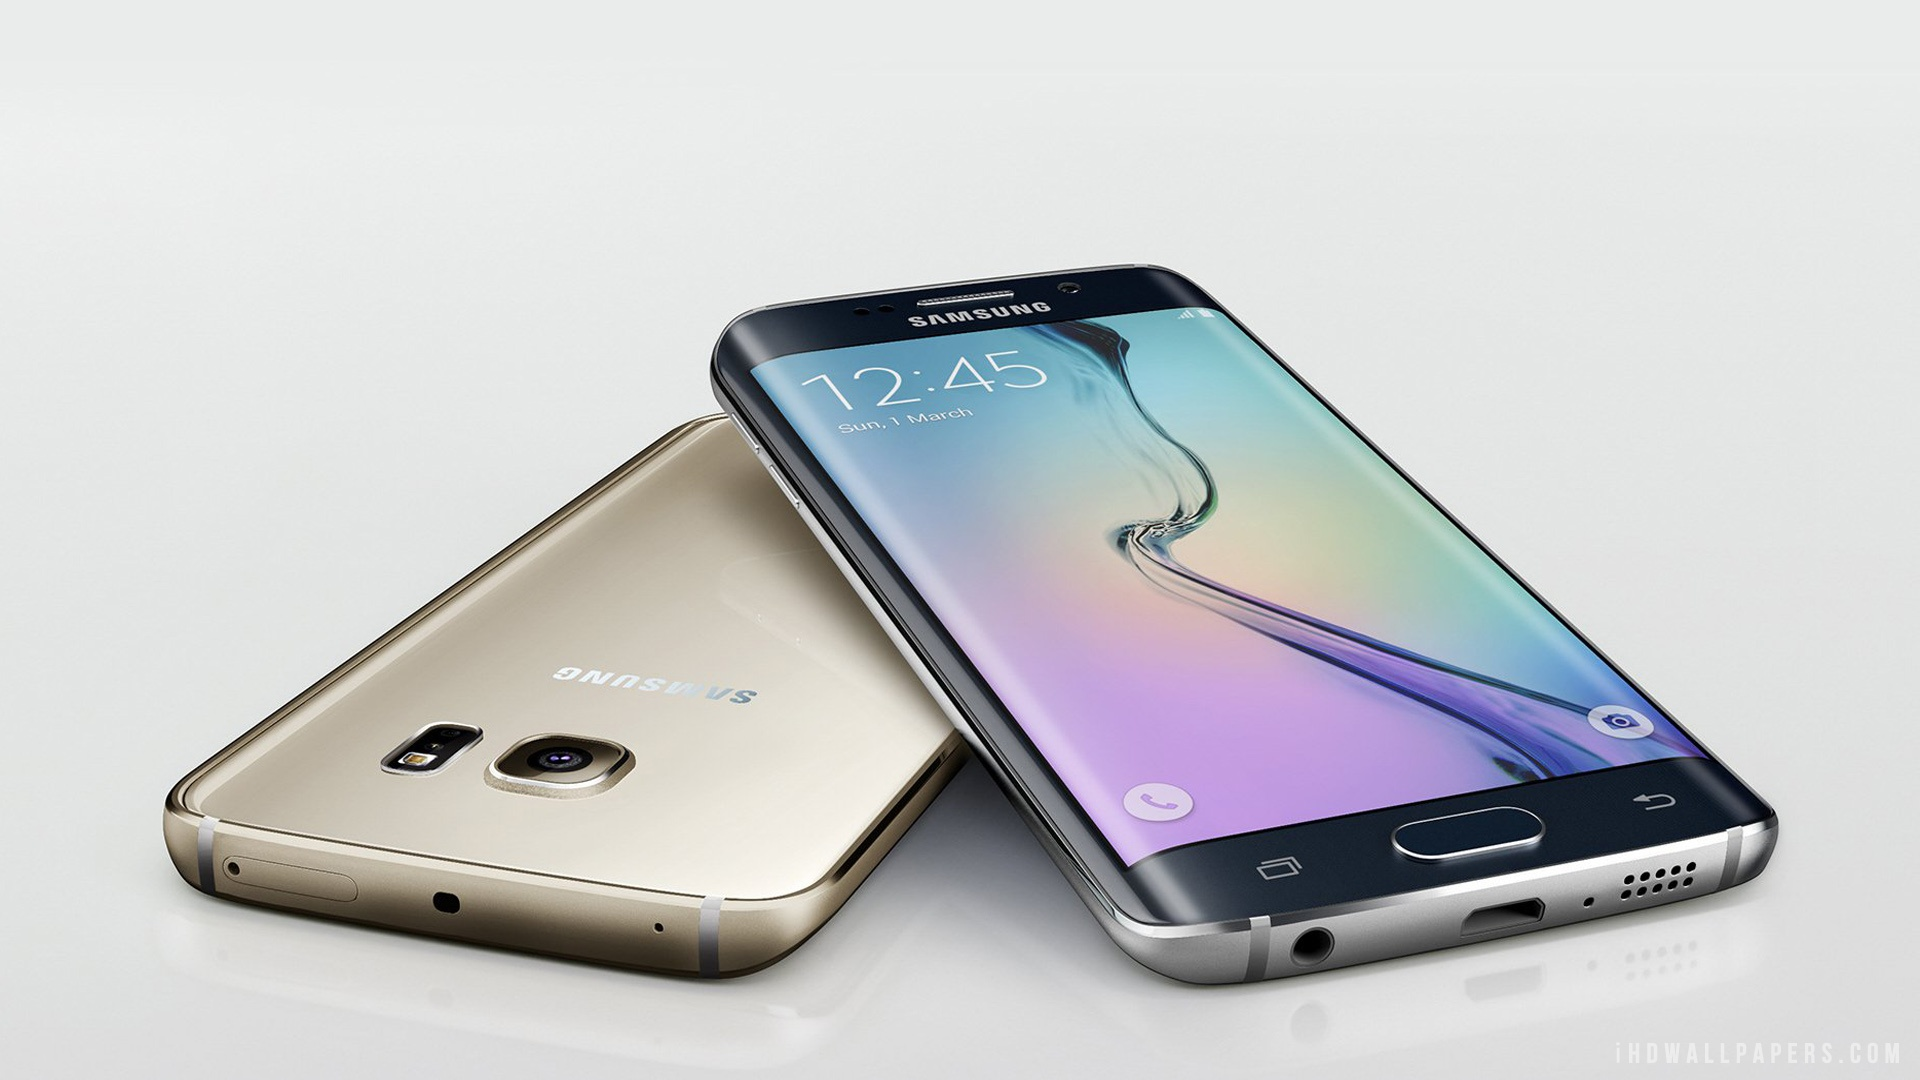 Samsung S6 Edge Wallpaper Hd 1080p Samsung S6 Edge Wallpaper Mobile 1920x1080 Wallpaper Teahub Io